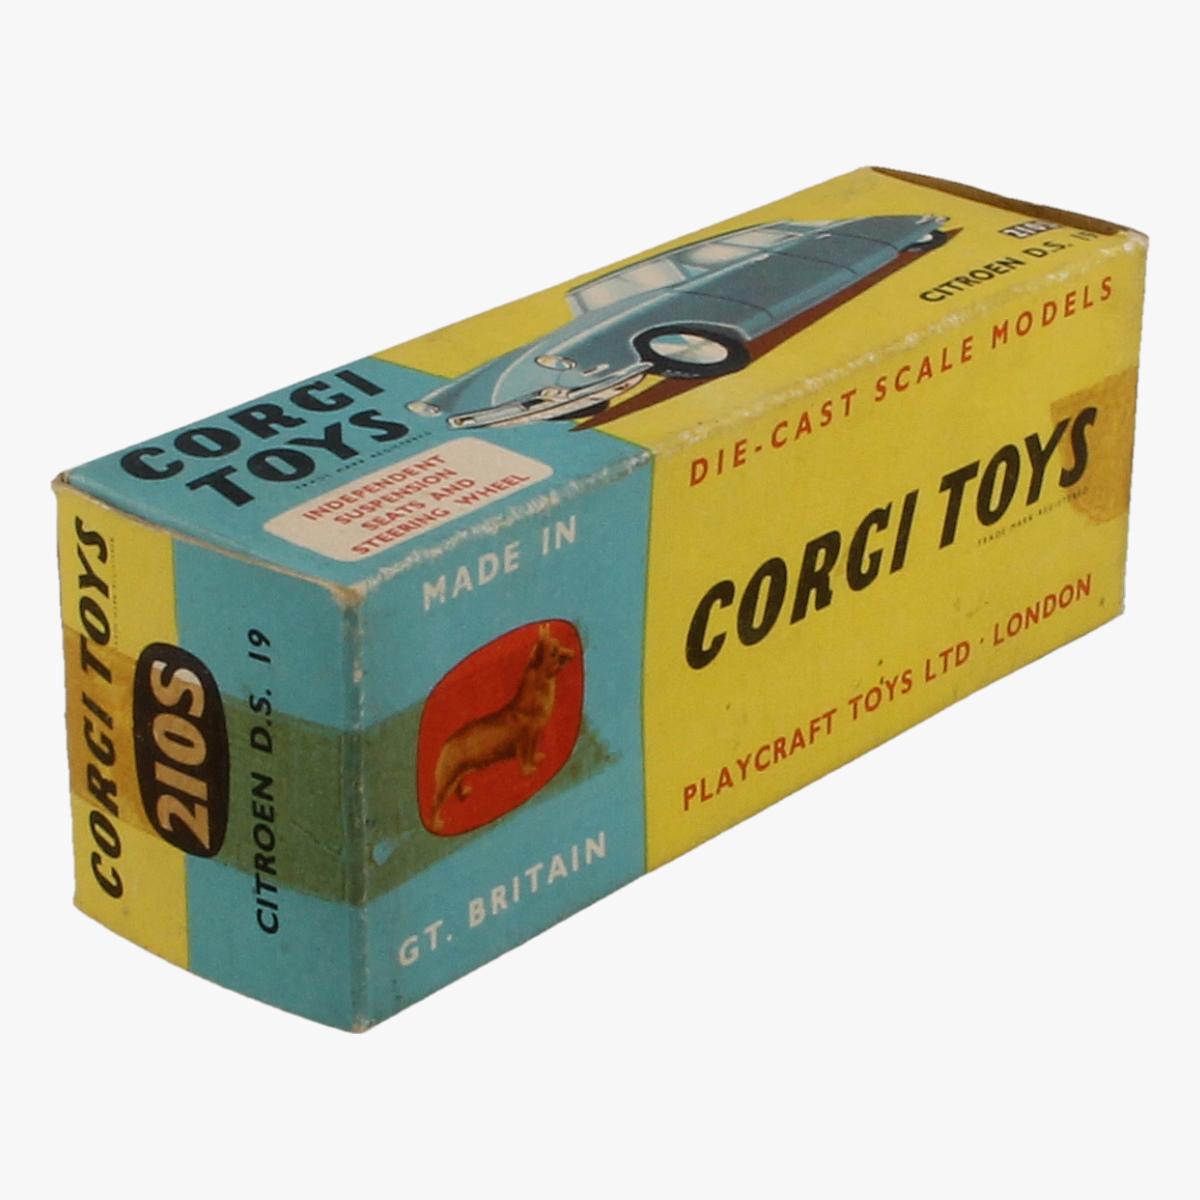 Afbeeldingen van Corgi Toys. Citroen D.S. 19. Nr 210s.